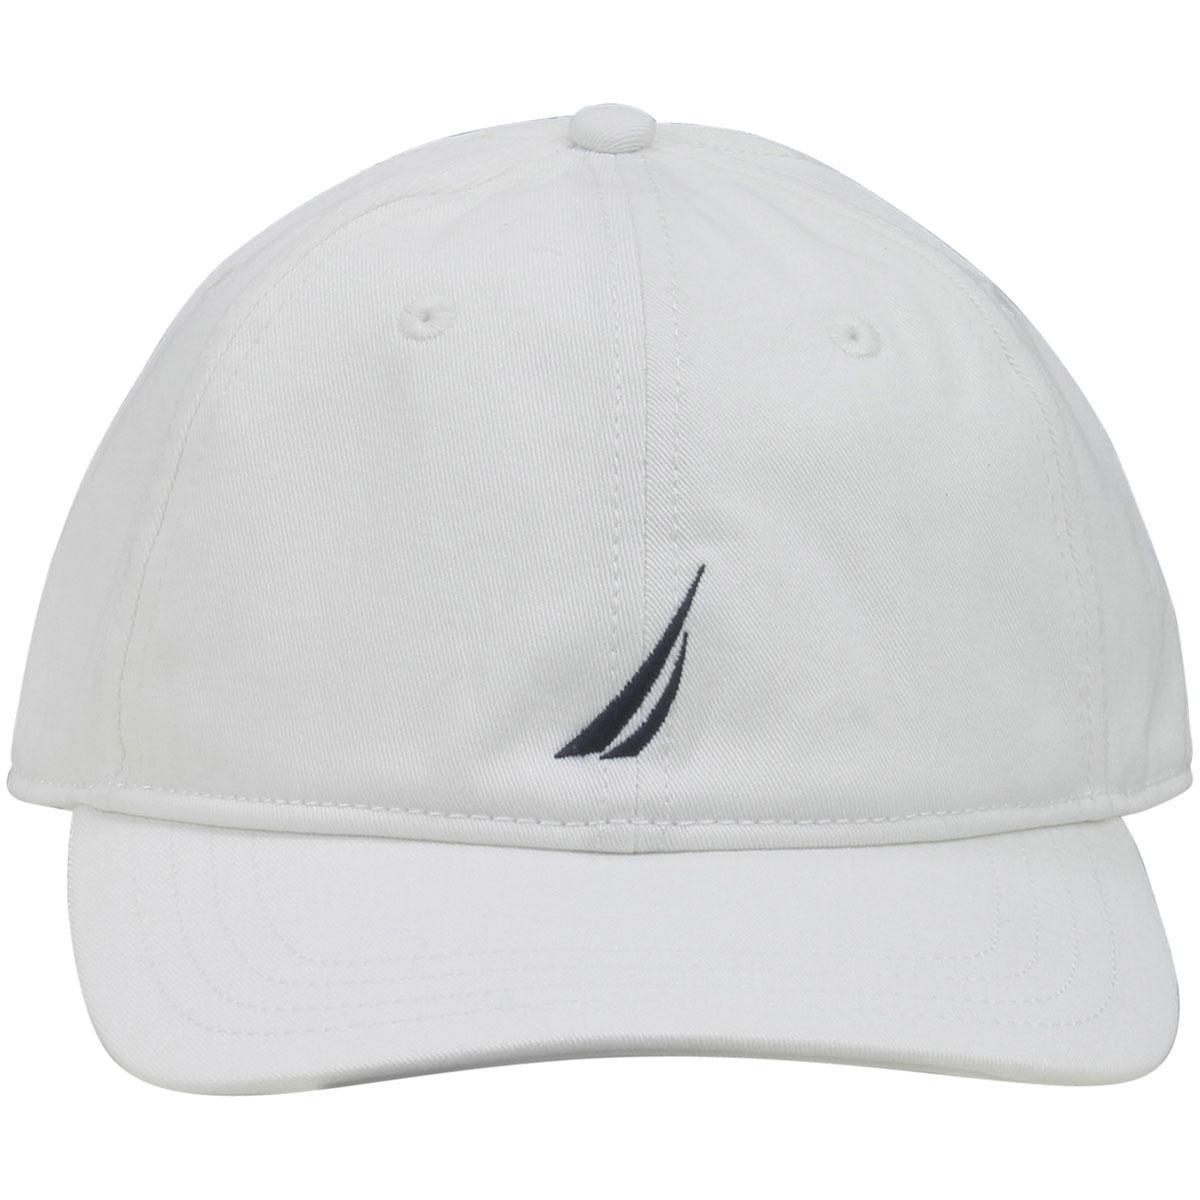 30d77f6c9d328 Nautica Anchor J-Class Adjustable Cotton Cap Baseball Hat (One Size Fits  Most)